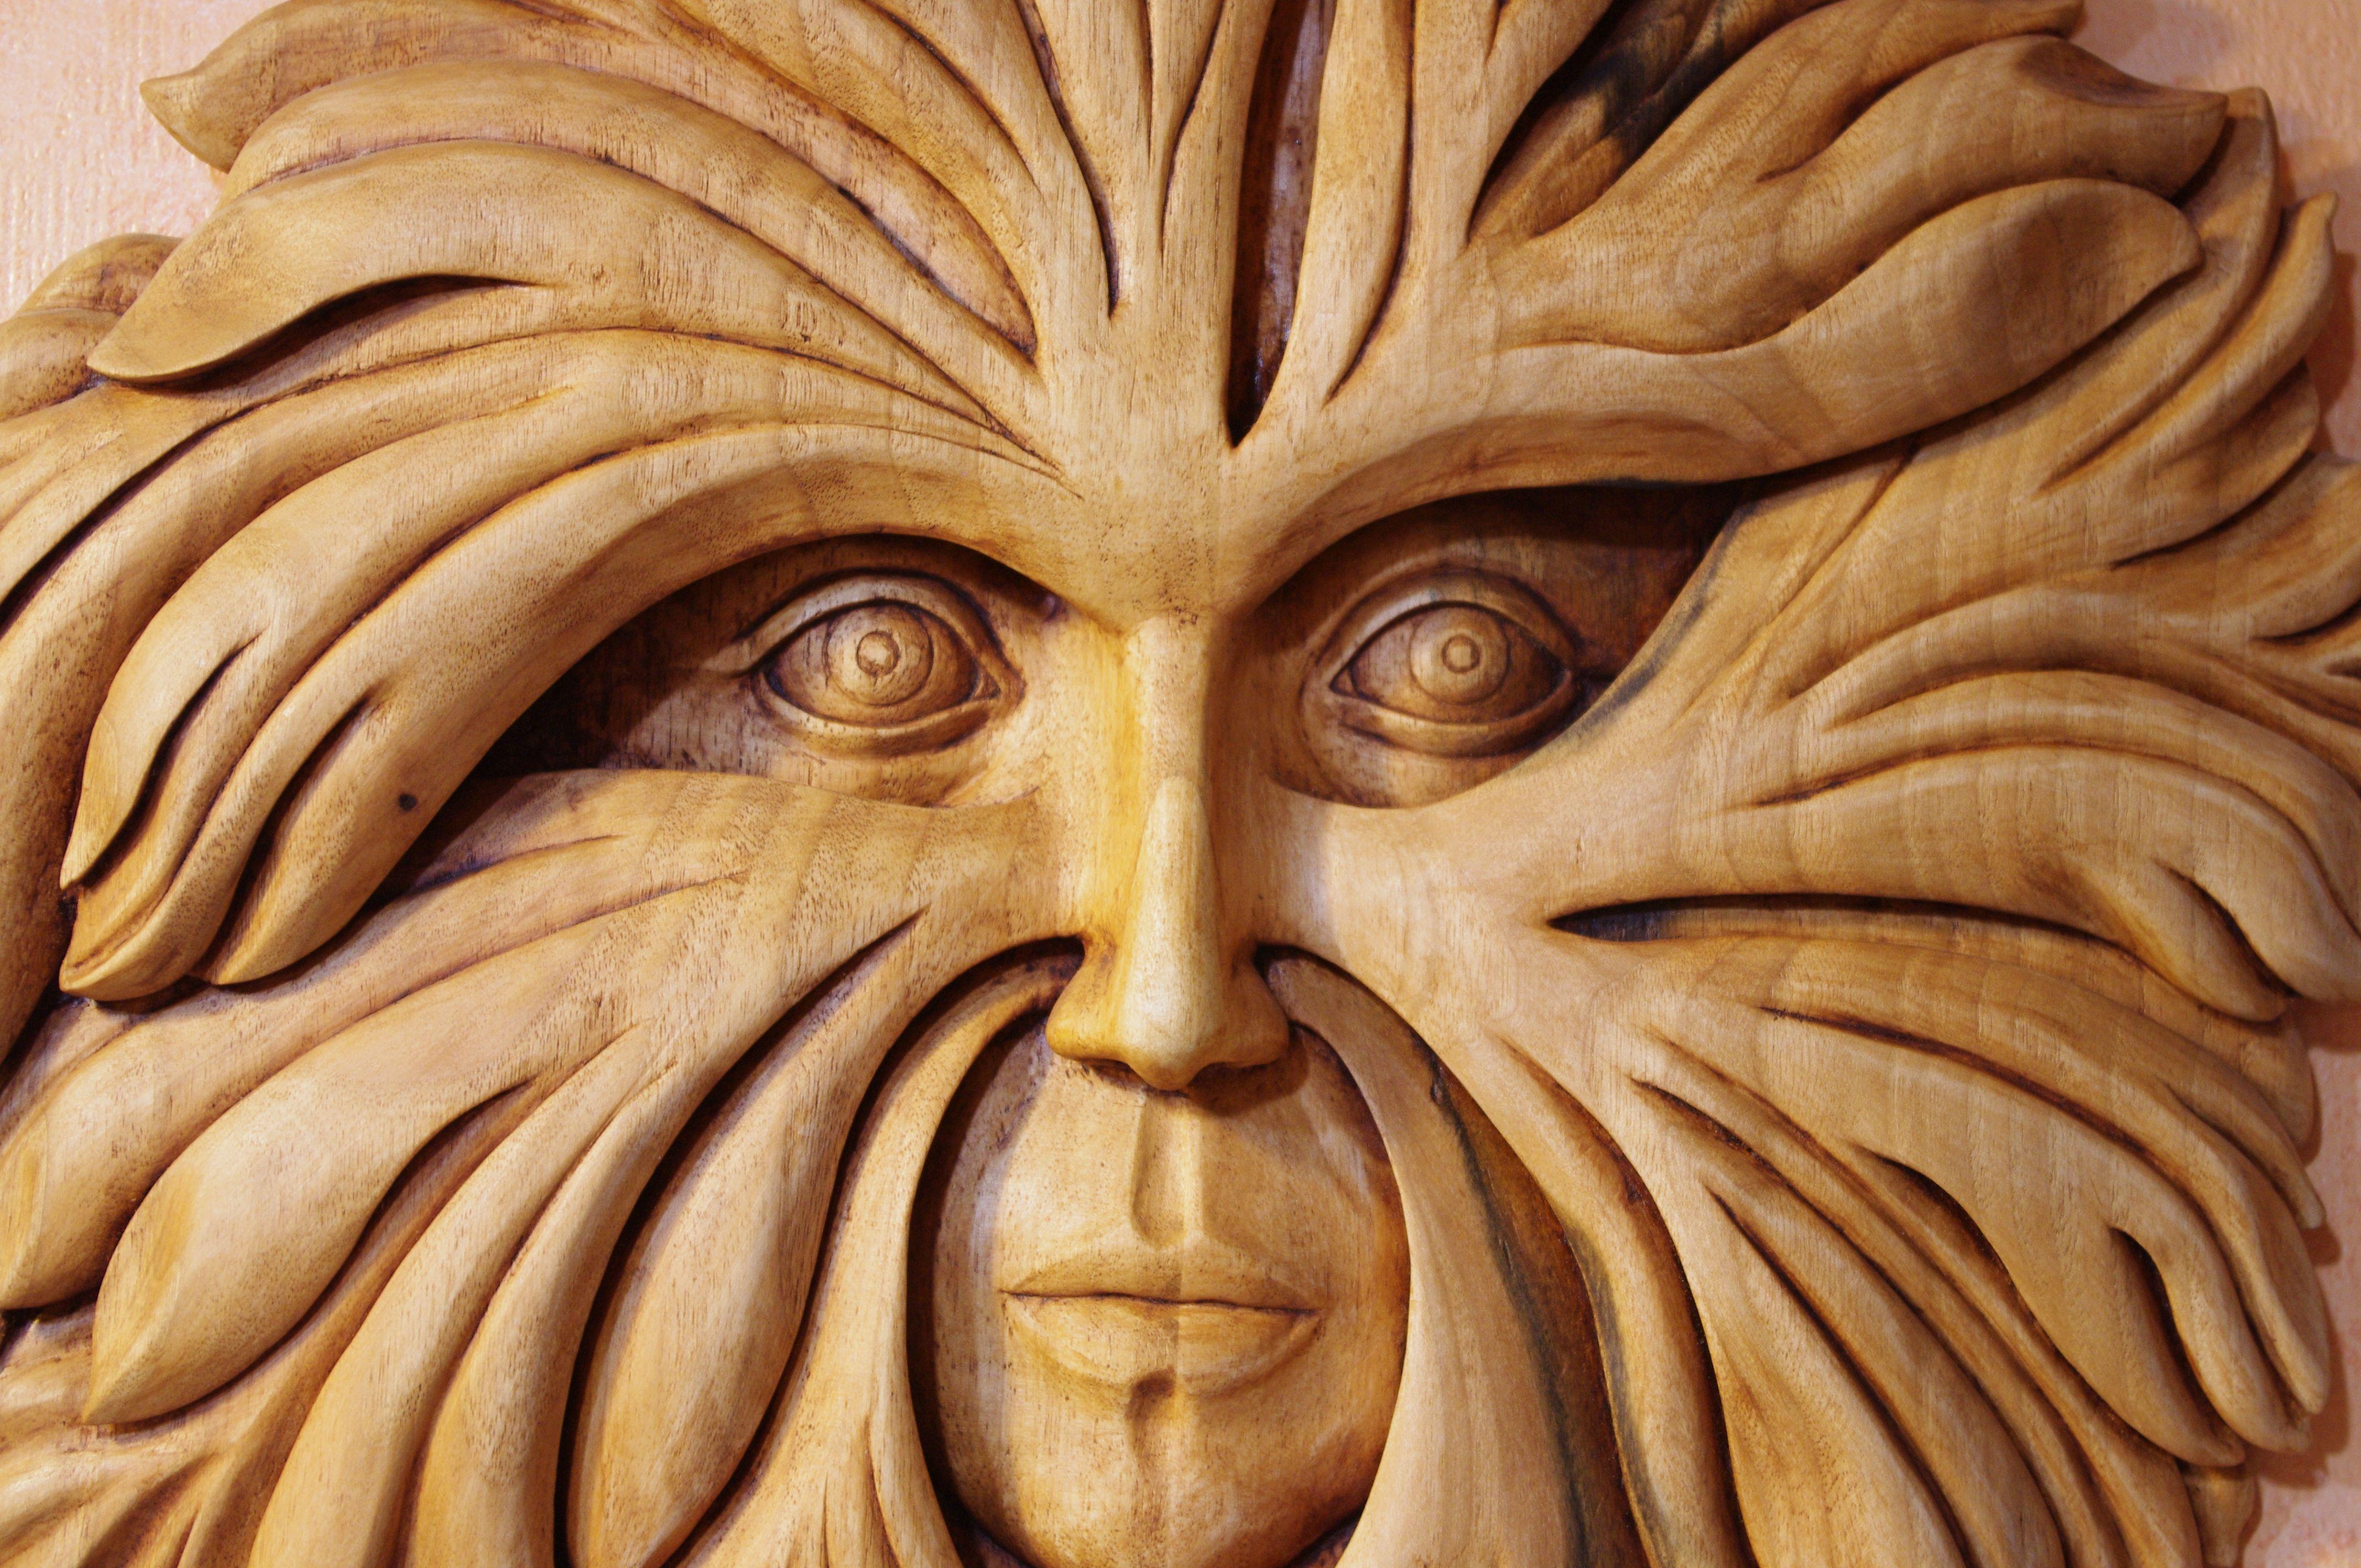 My Student Work Galleryalirezanoori Woodcarving Woodart Woodsculpture Handmade Wooden Creative Art Drawing Wood Sculpture Lion Sculpture Art